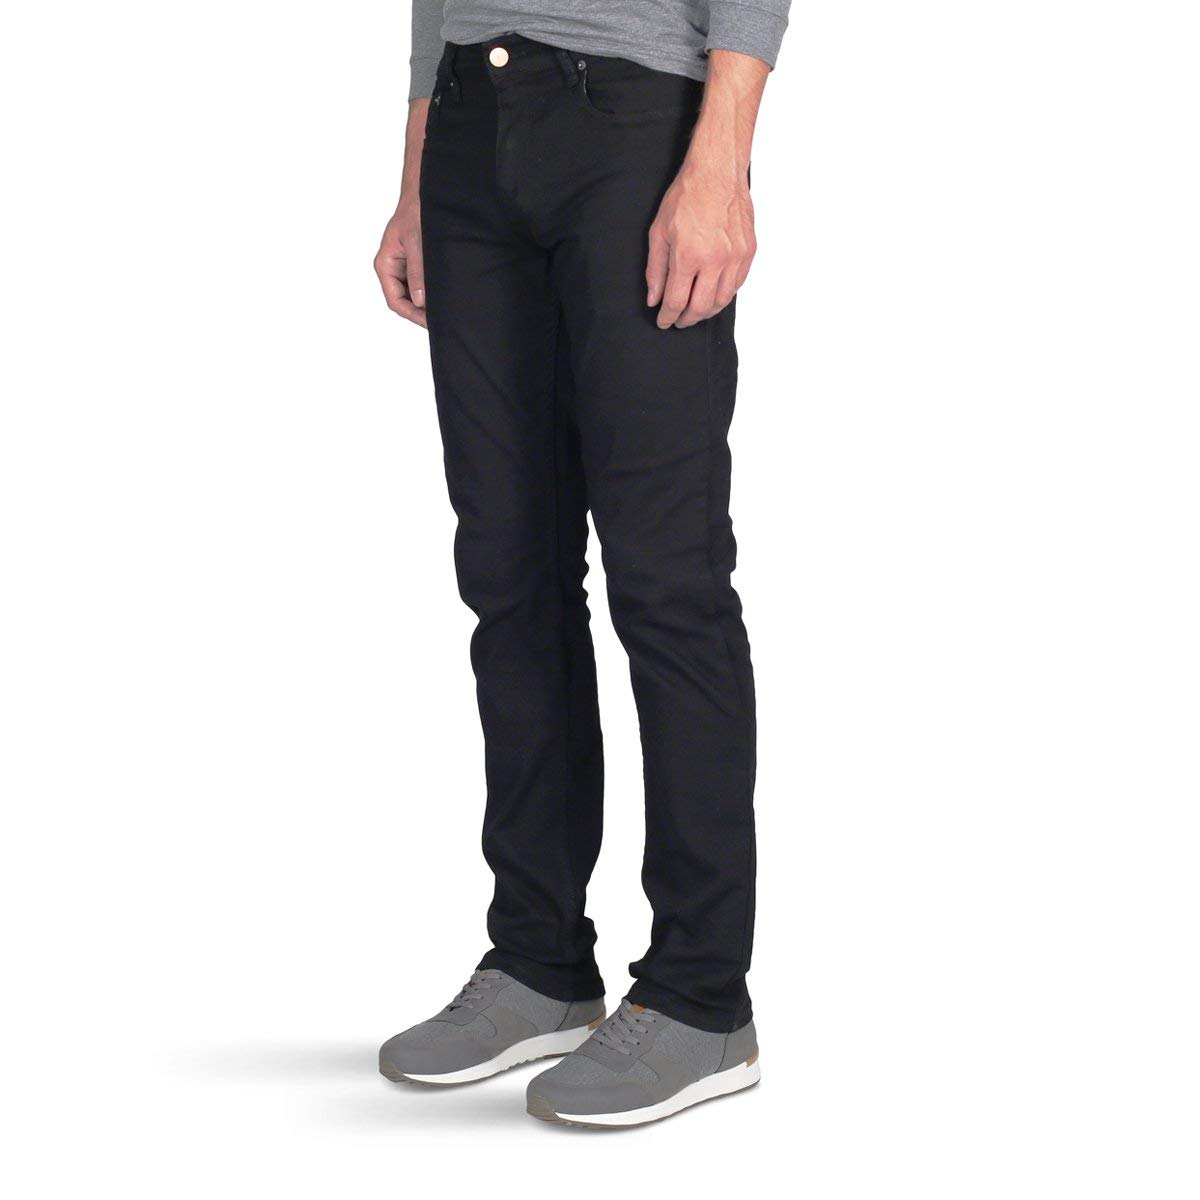 Amazon.com: Mugsy Jeans – Tintas calamares – Pantalones ...